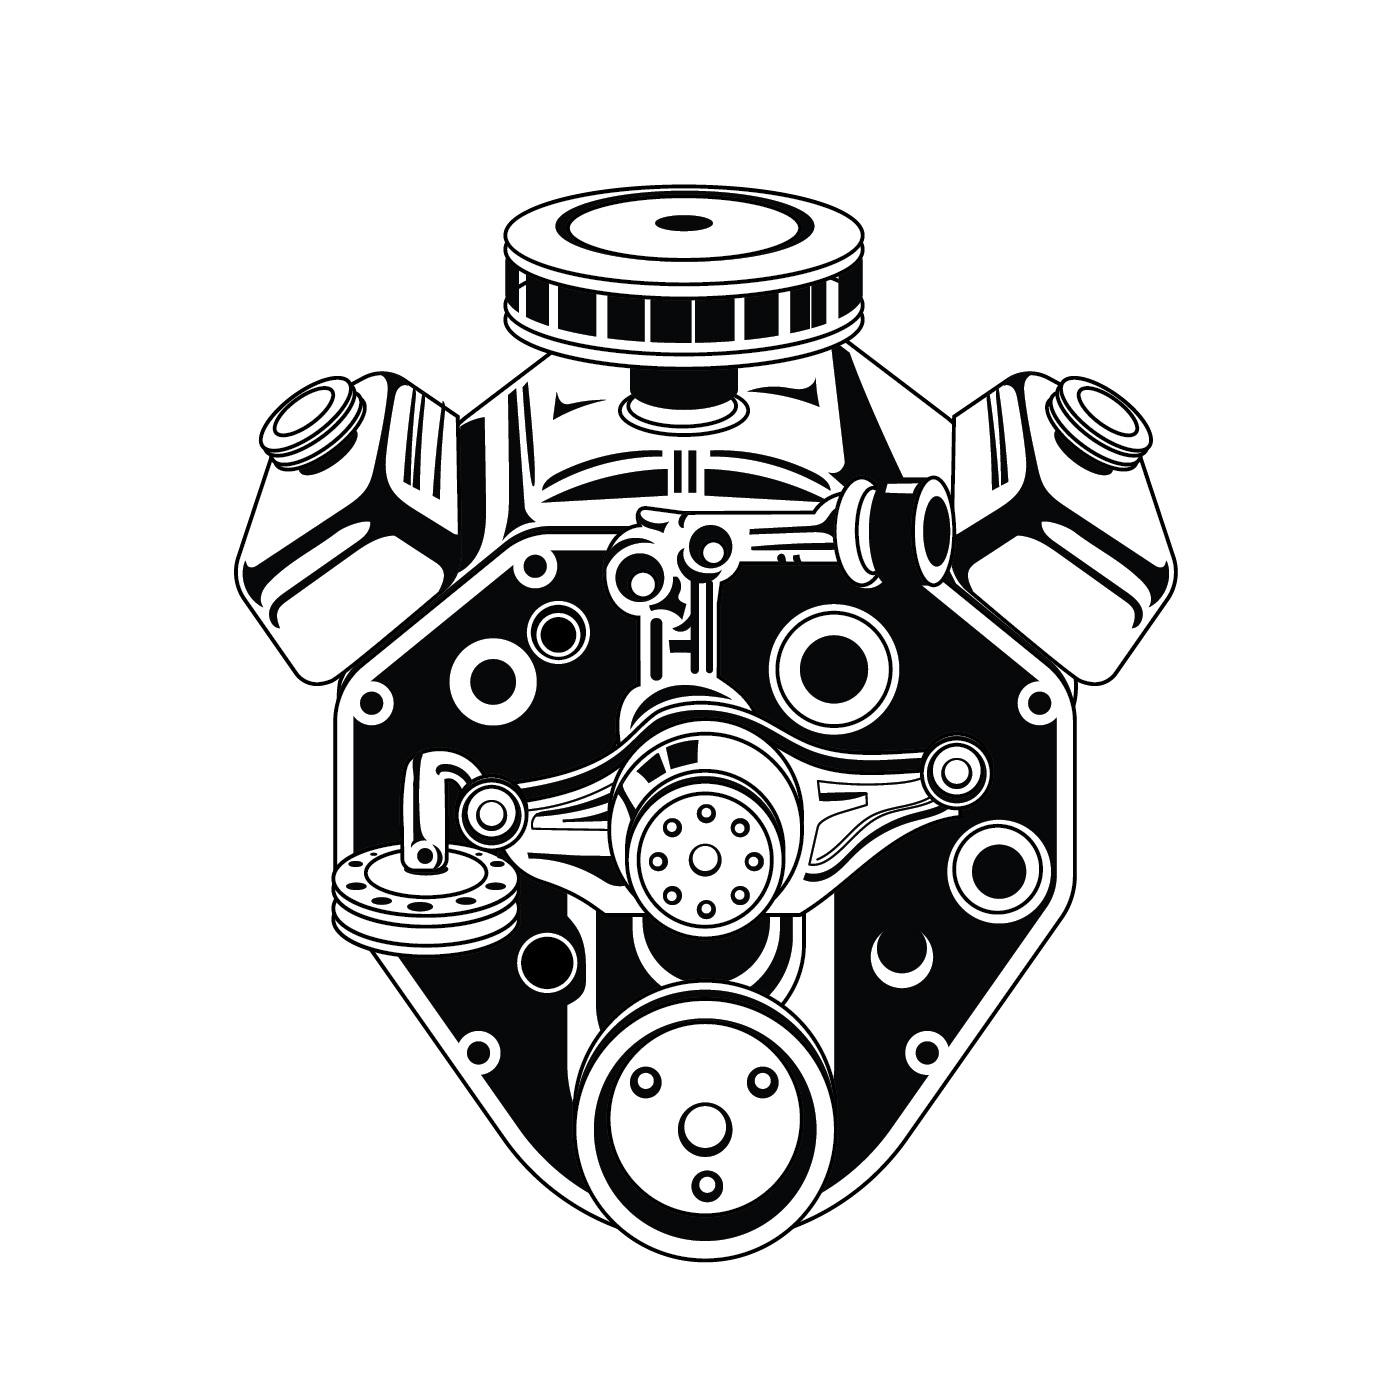 Monochrome Illustration Of Car Engine Download Free